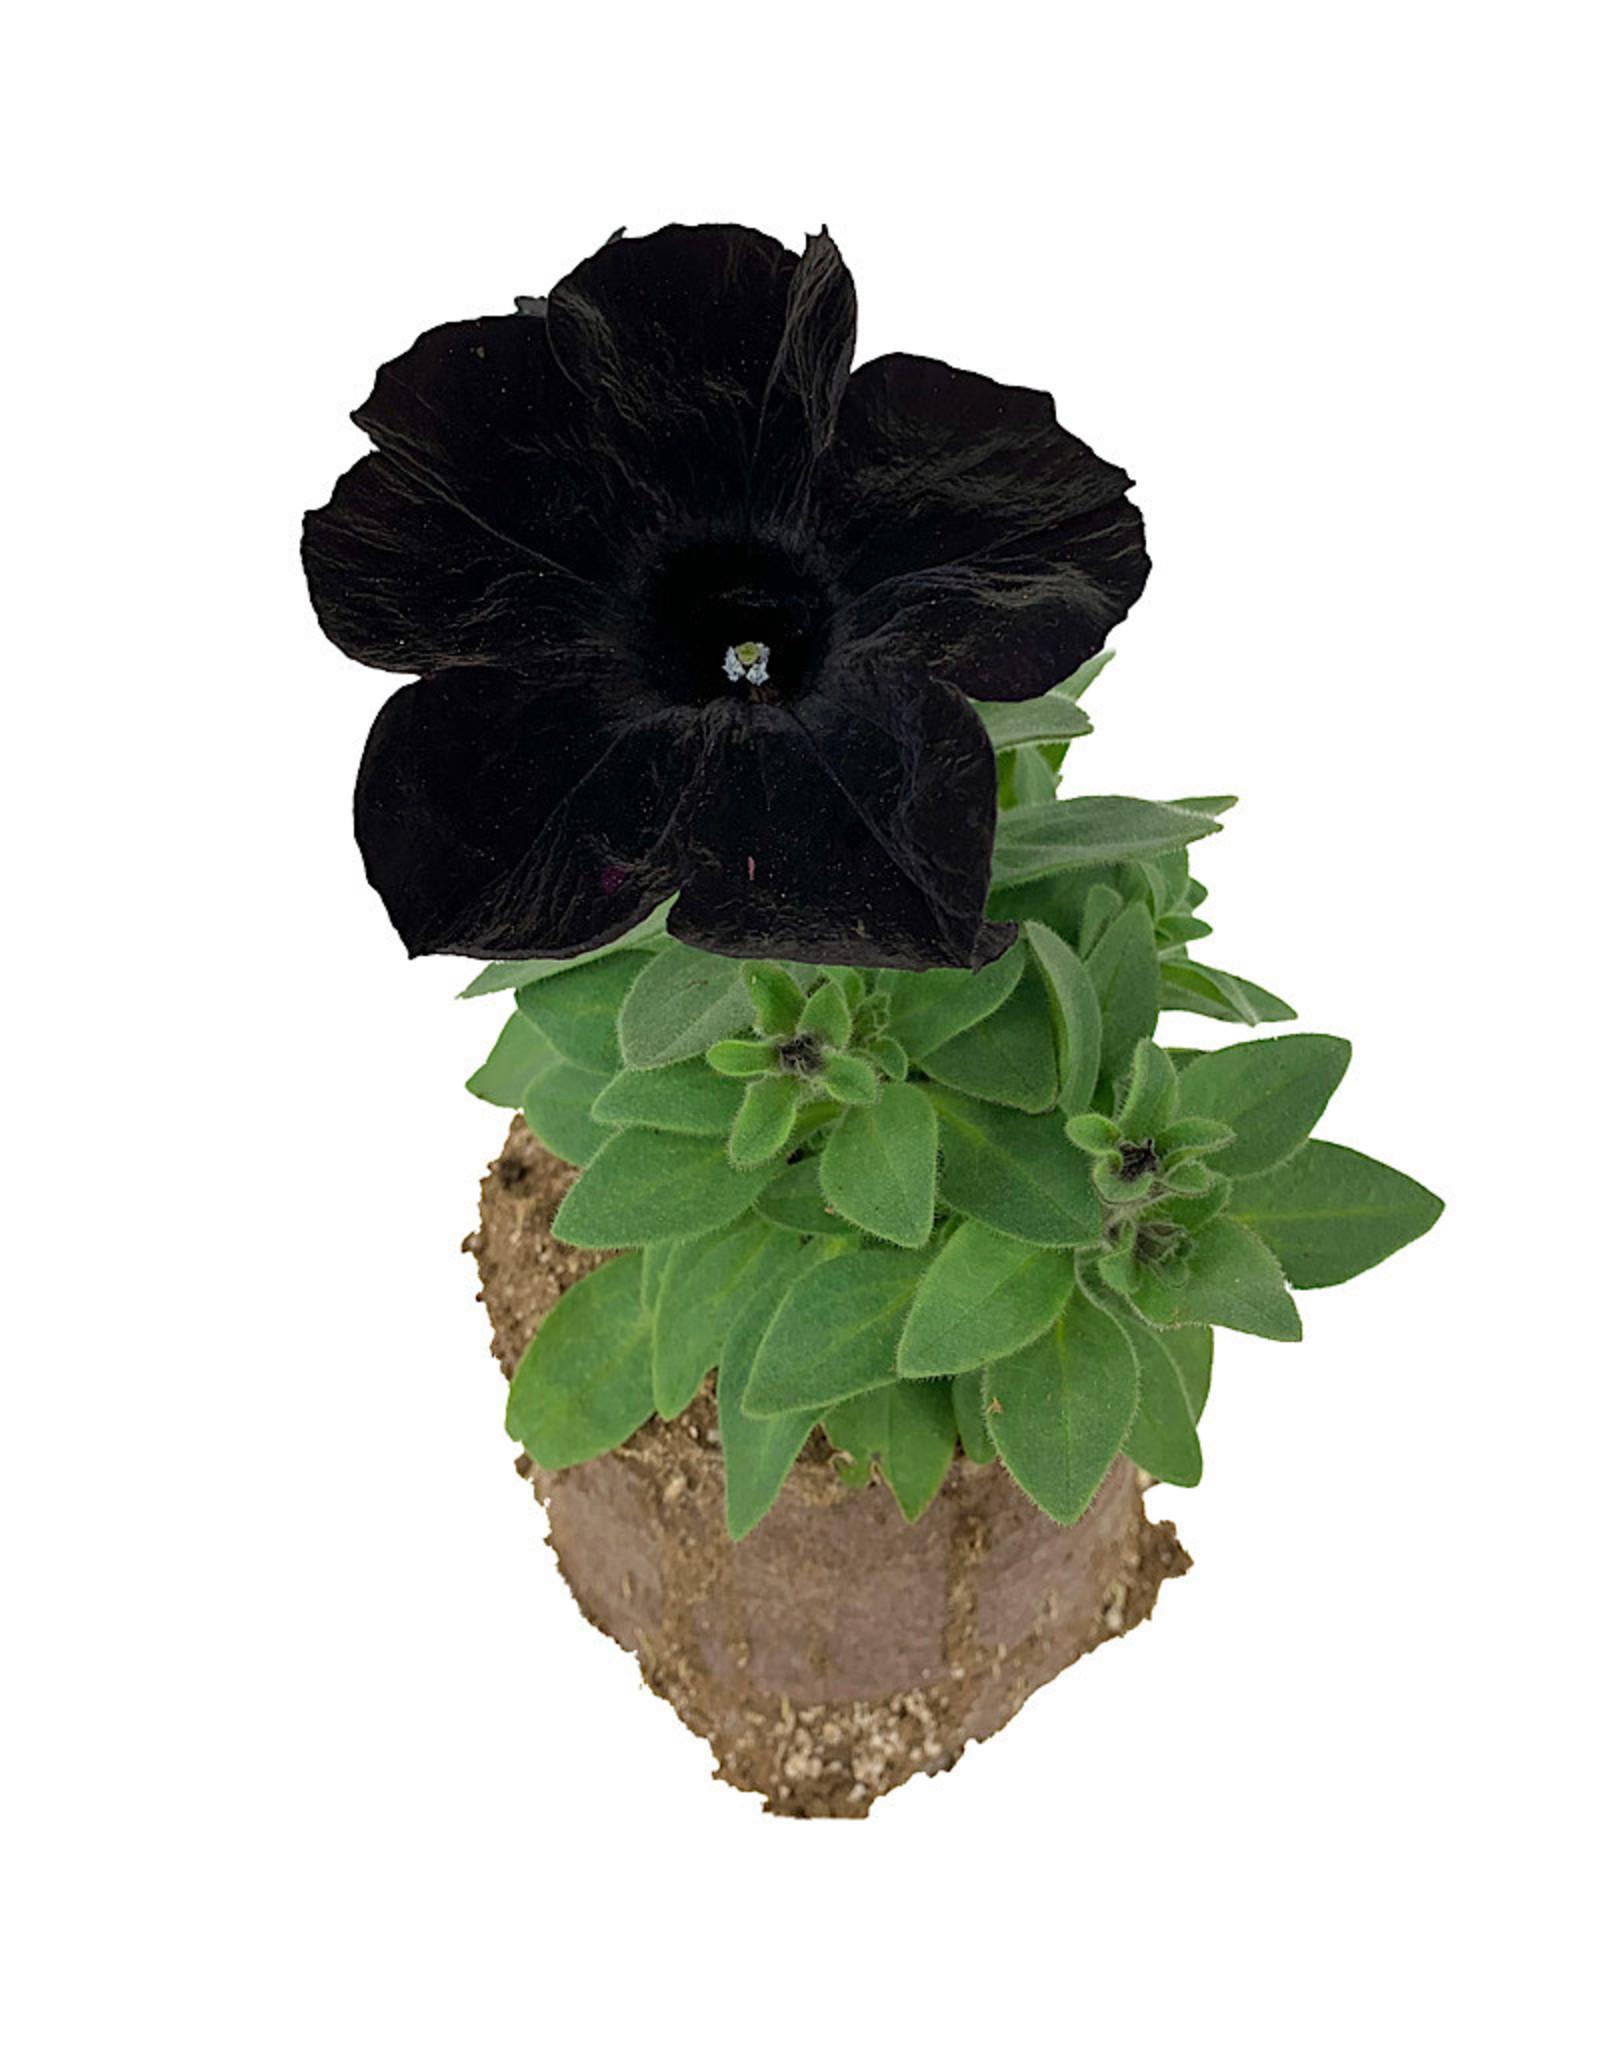 Petunia 'Crazytunia Black Mamba' 4 inch